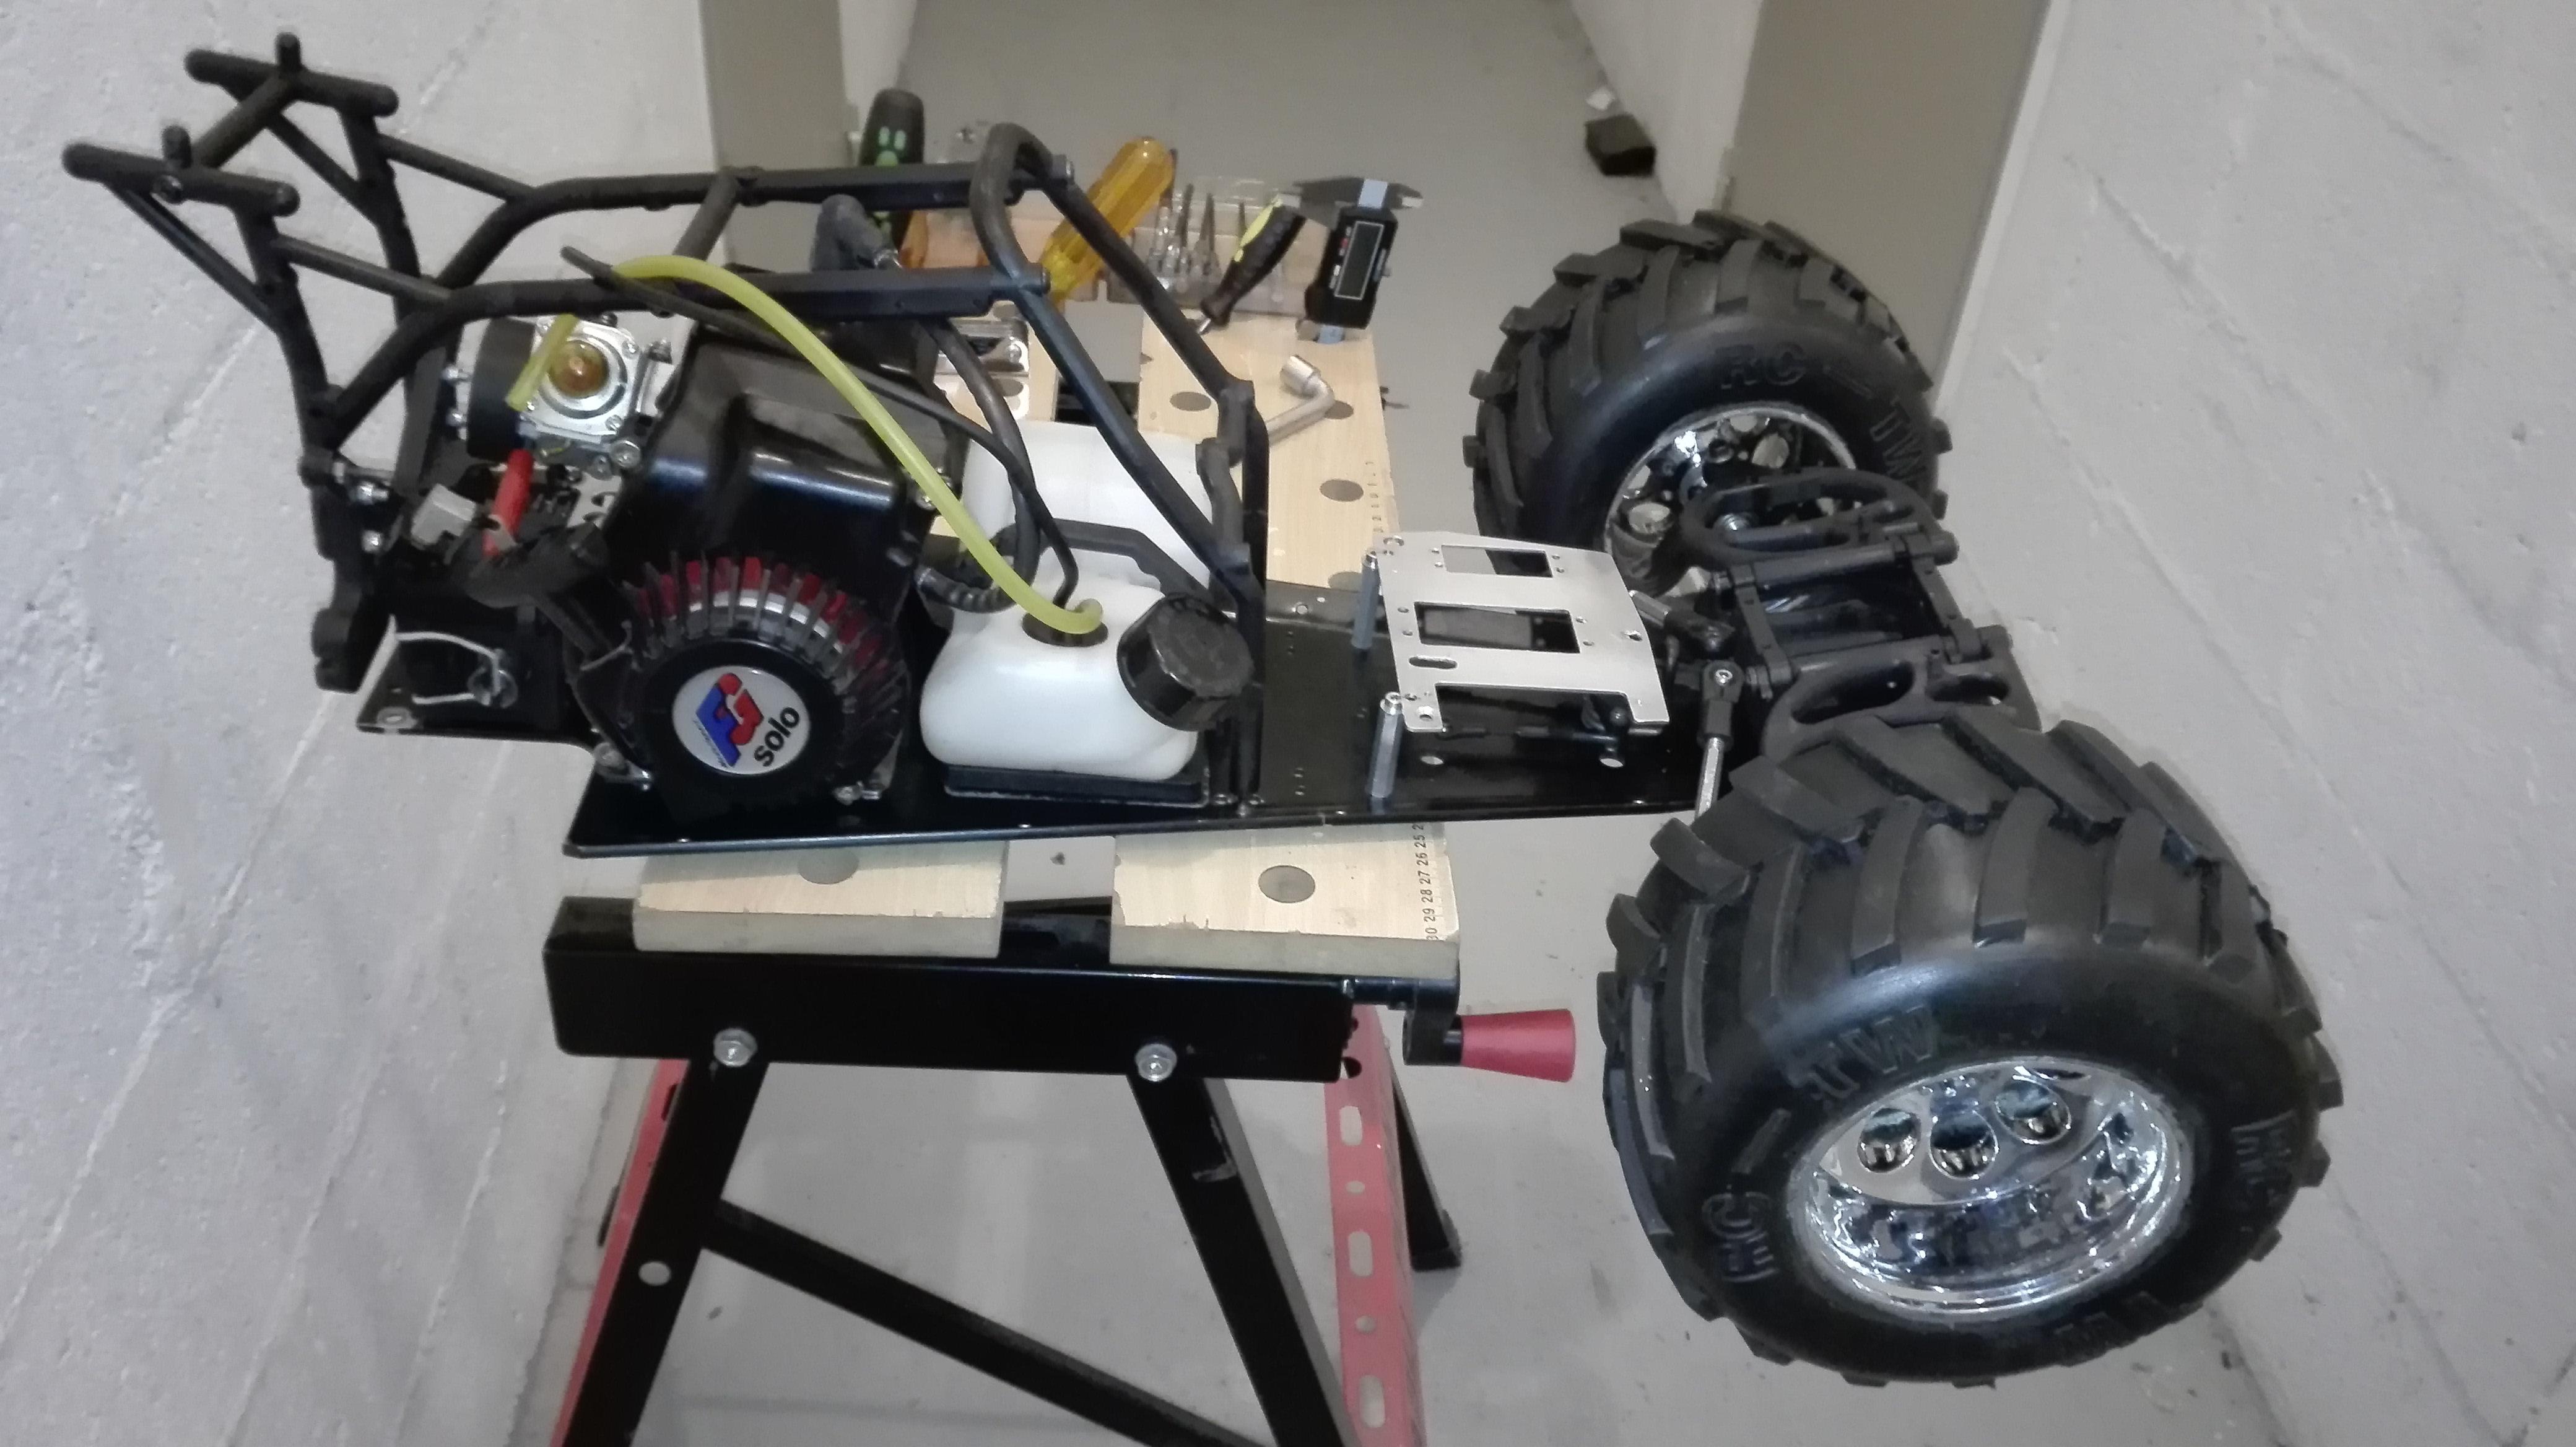 re-montage complet monster truck FG depuis un chassis nu - Page 2 18013010472688655